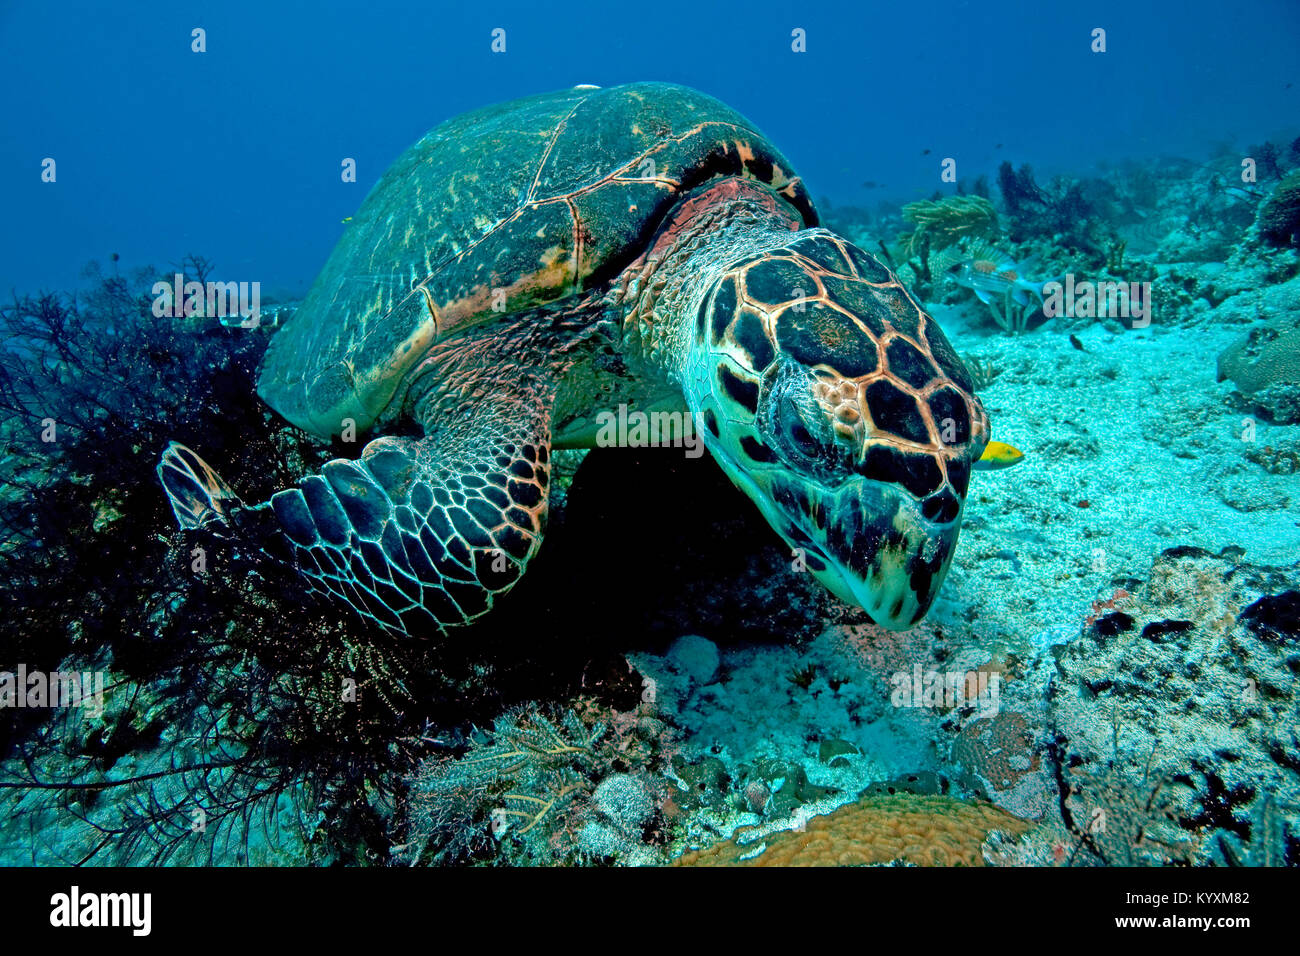 Tartaruga embricata (Eretmochelys imbricata), Playa del Carmen, la penisola dello Yucatan, Messico, Caraibi Immagini Stock